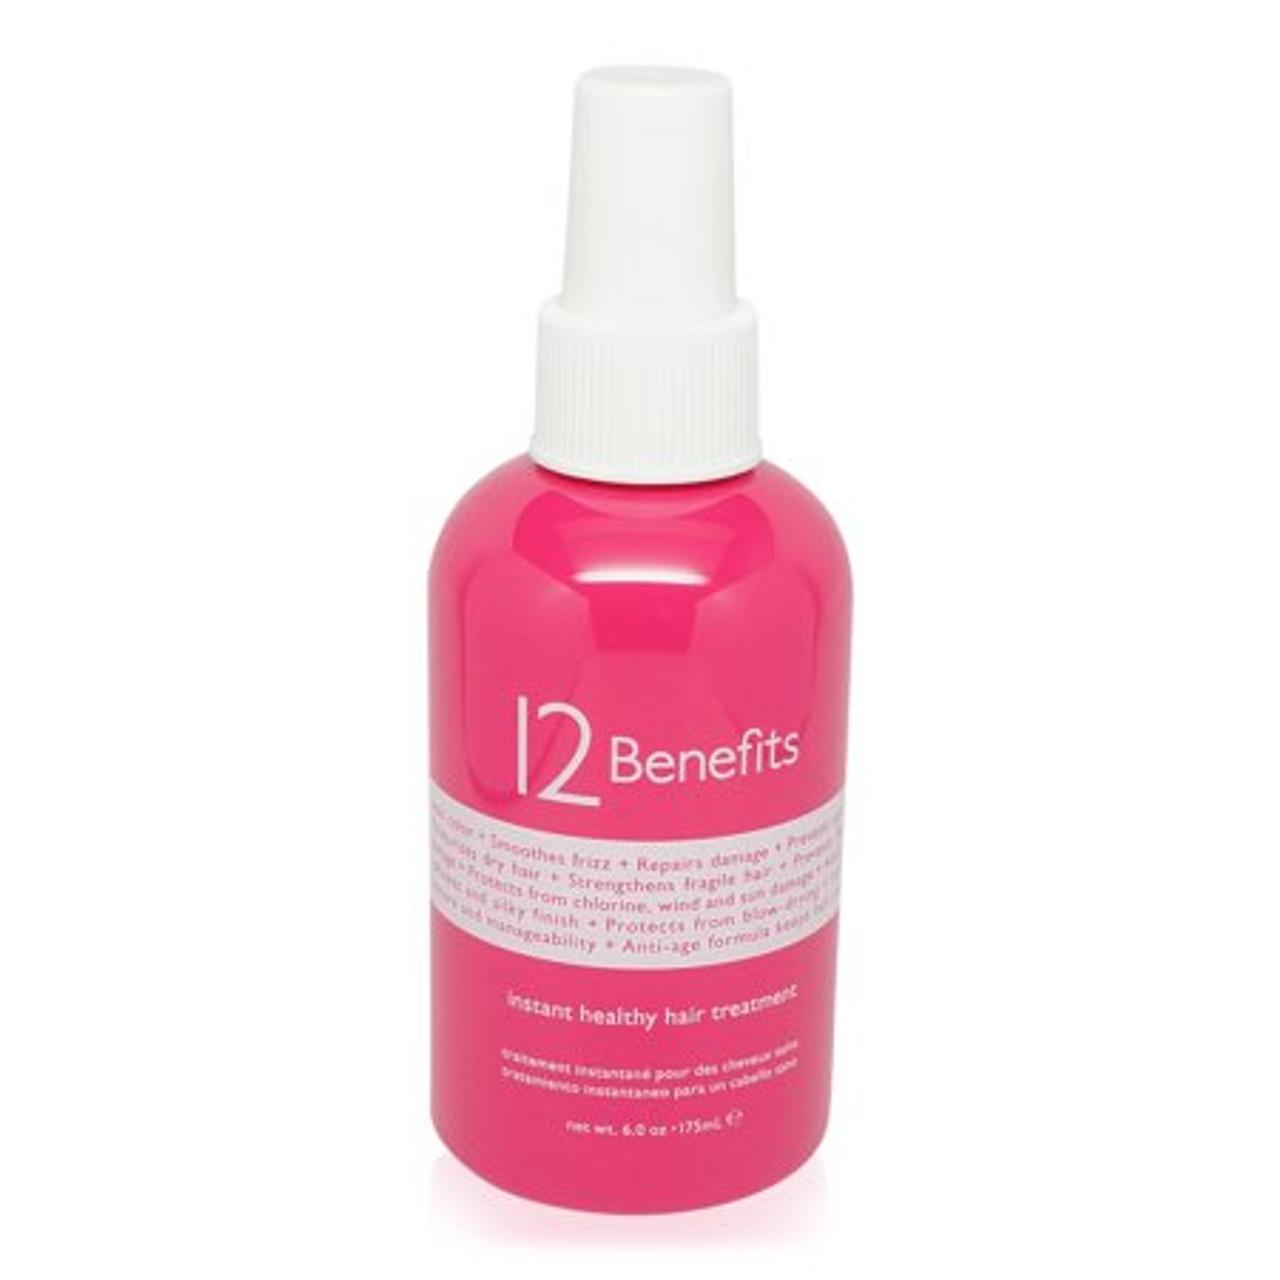 12 Benifits Instant Health Hai